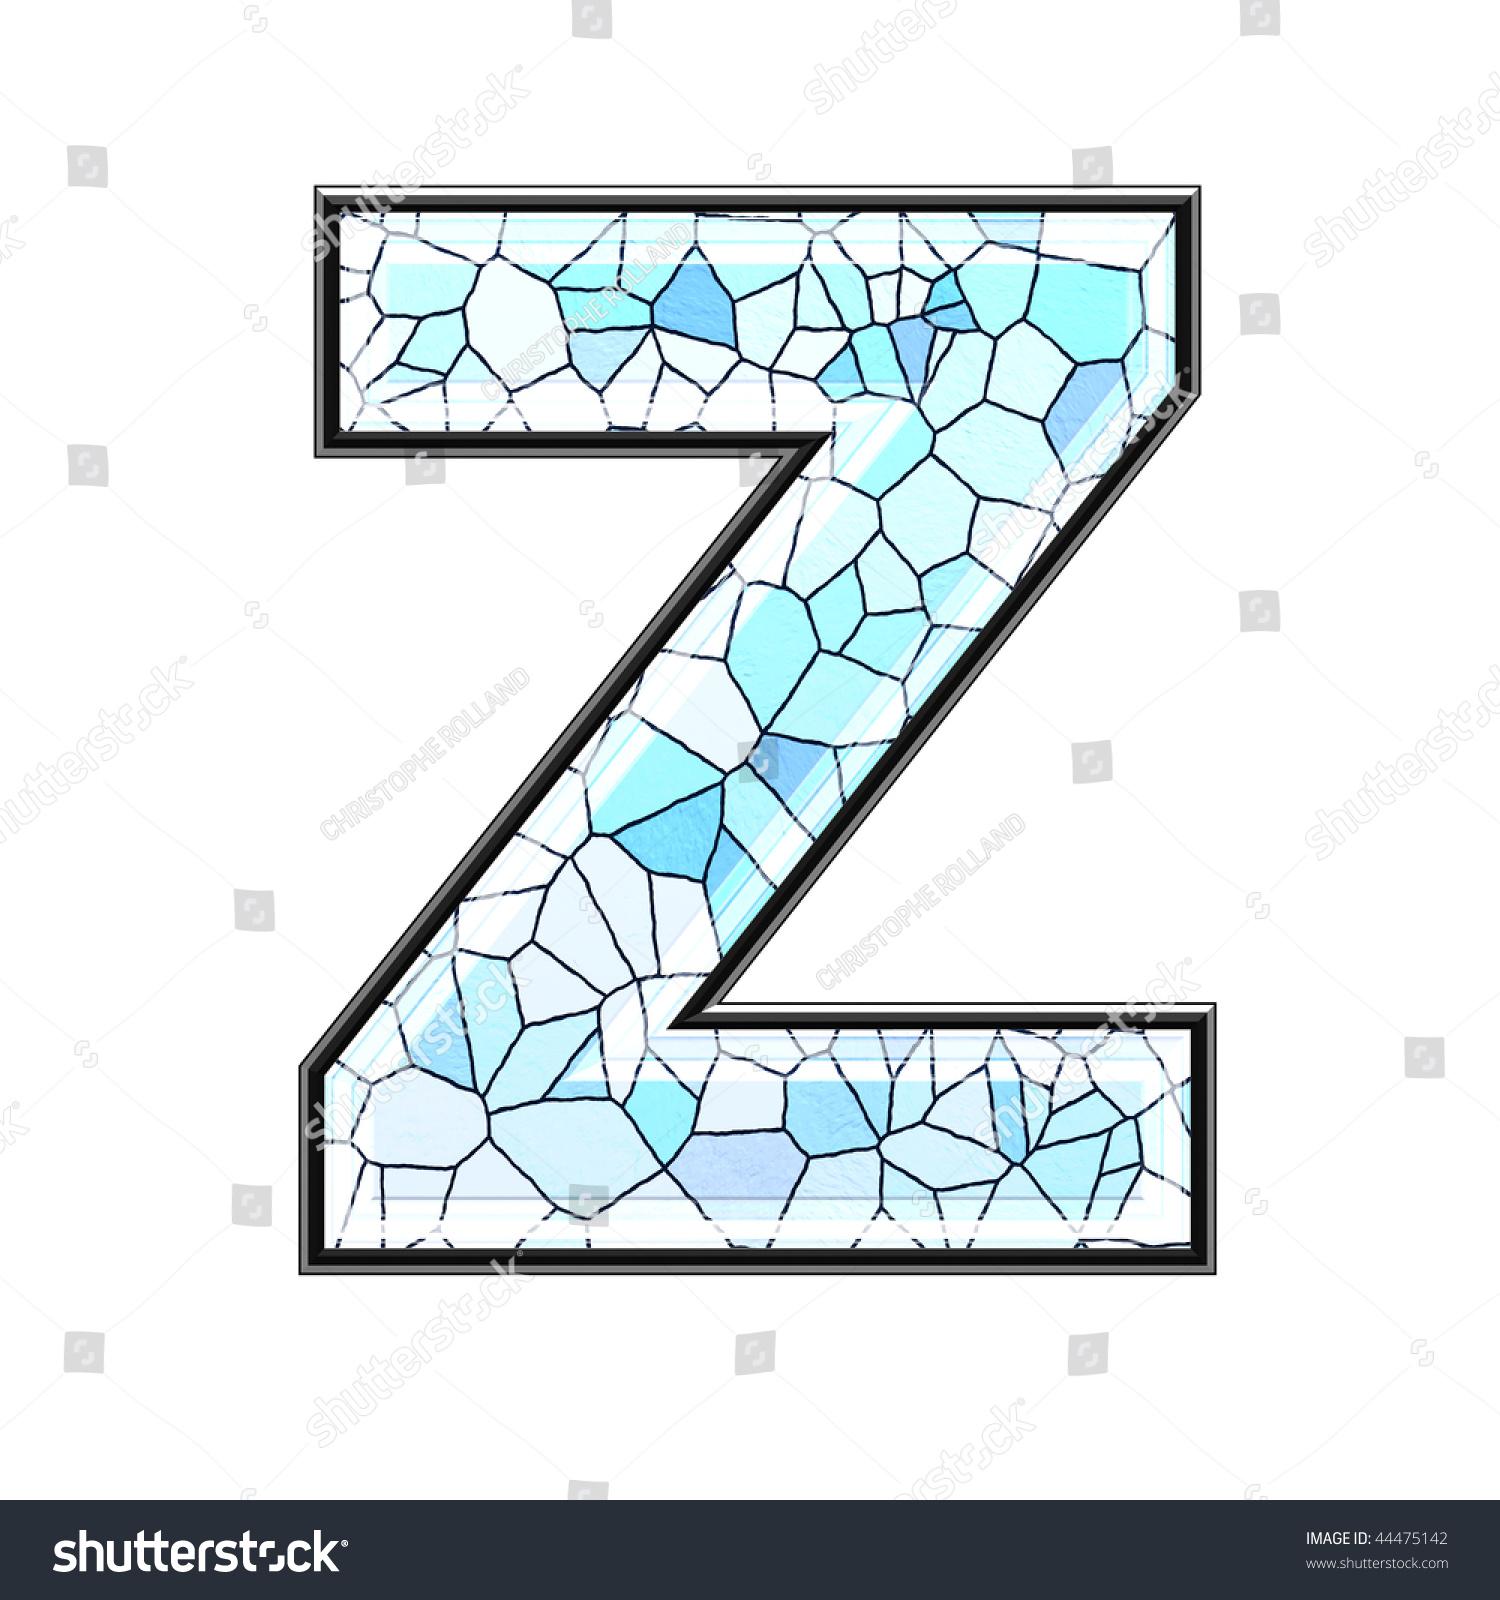 Ceramic Alphabet Tiles 7737511 Gabor Sagmajsterfo